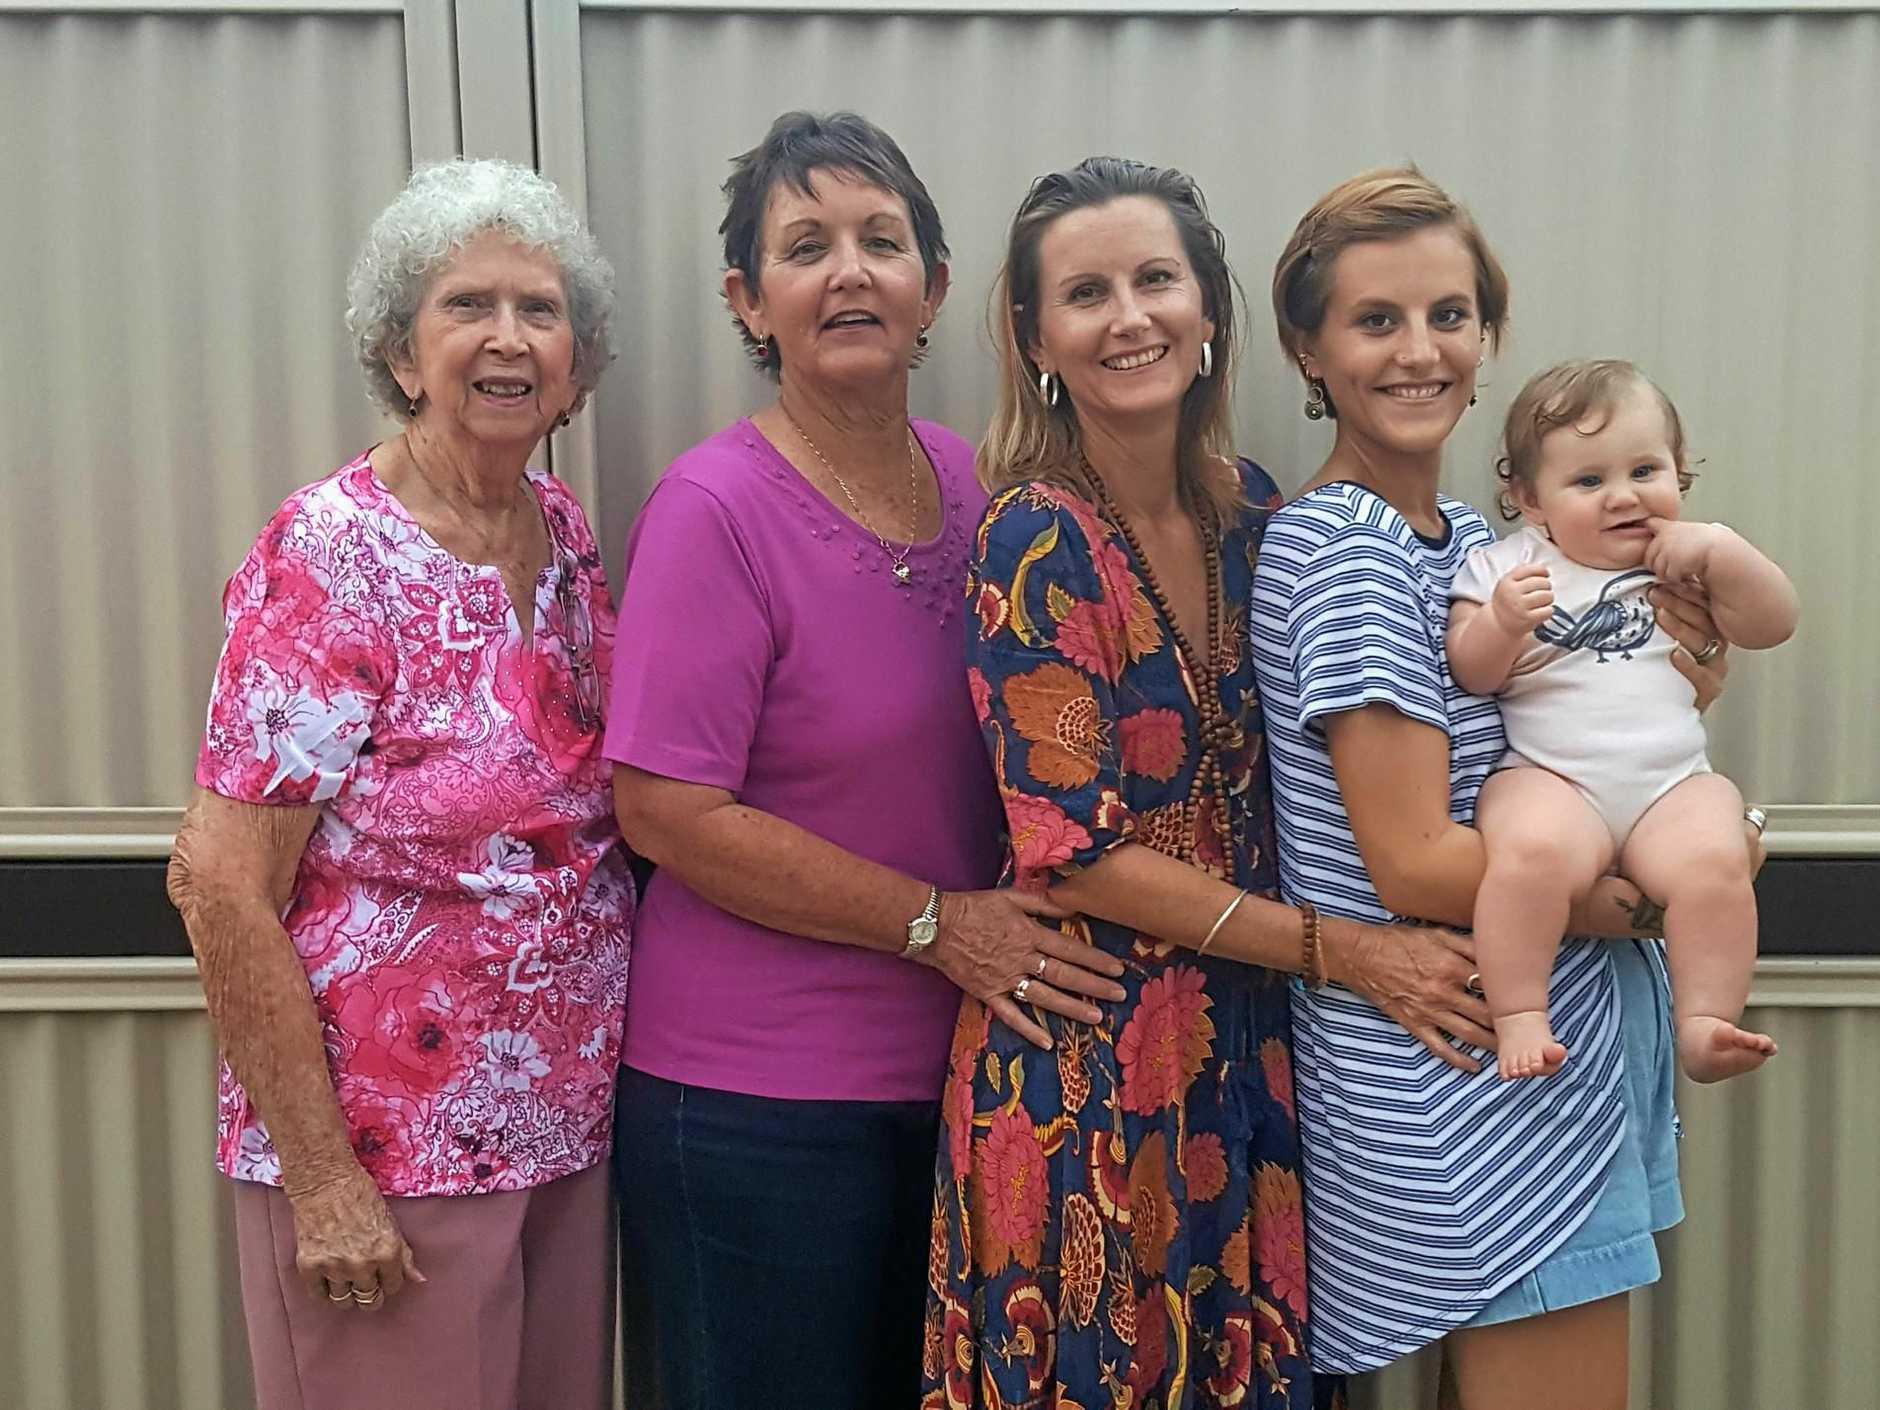 DYNASTY: Frida Roberts (eight months) with mother Alaina Roberts, 21, grandmother Katrina Lanzon, 44, great-grandmother Pamela Carter, 64, and great-great grandmother Mona Lees, 86.